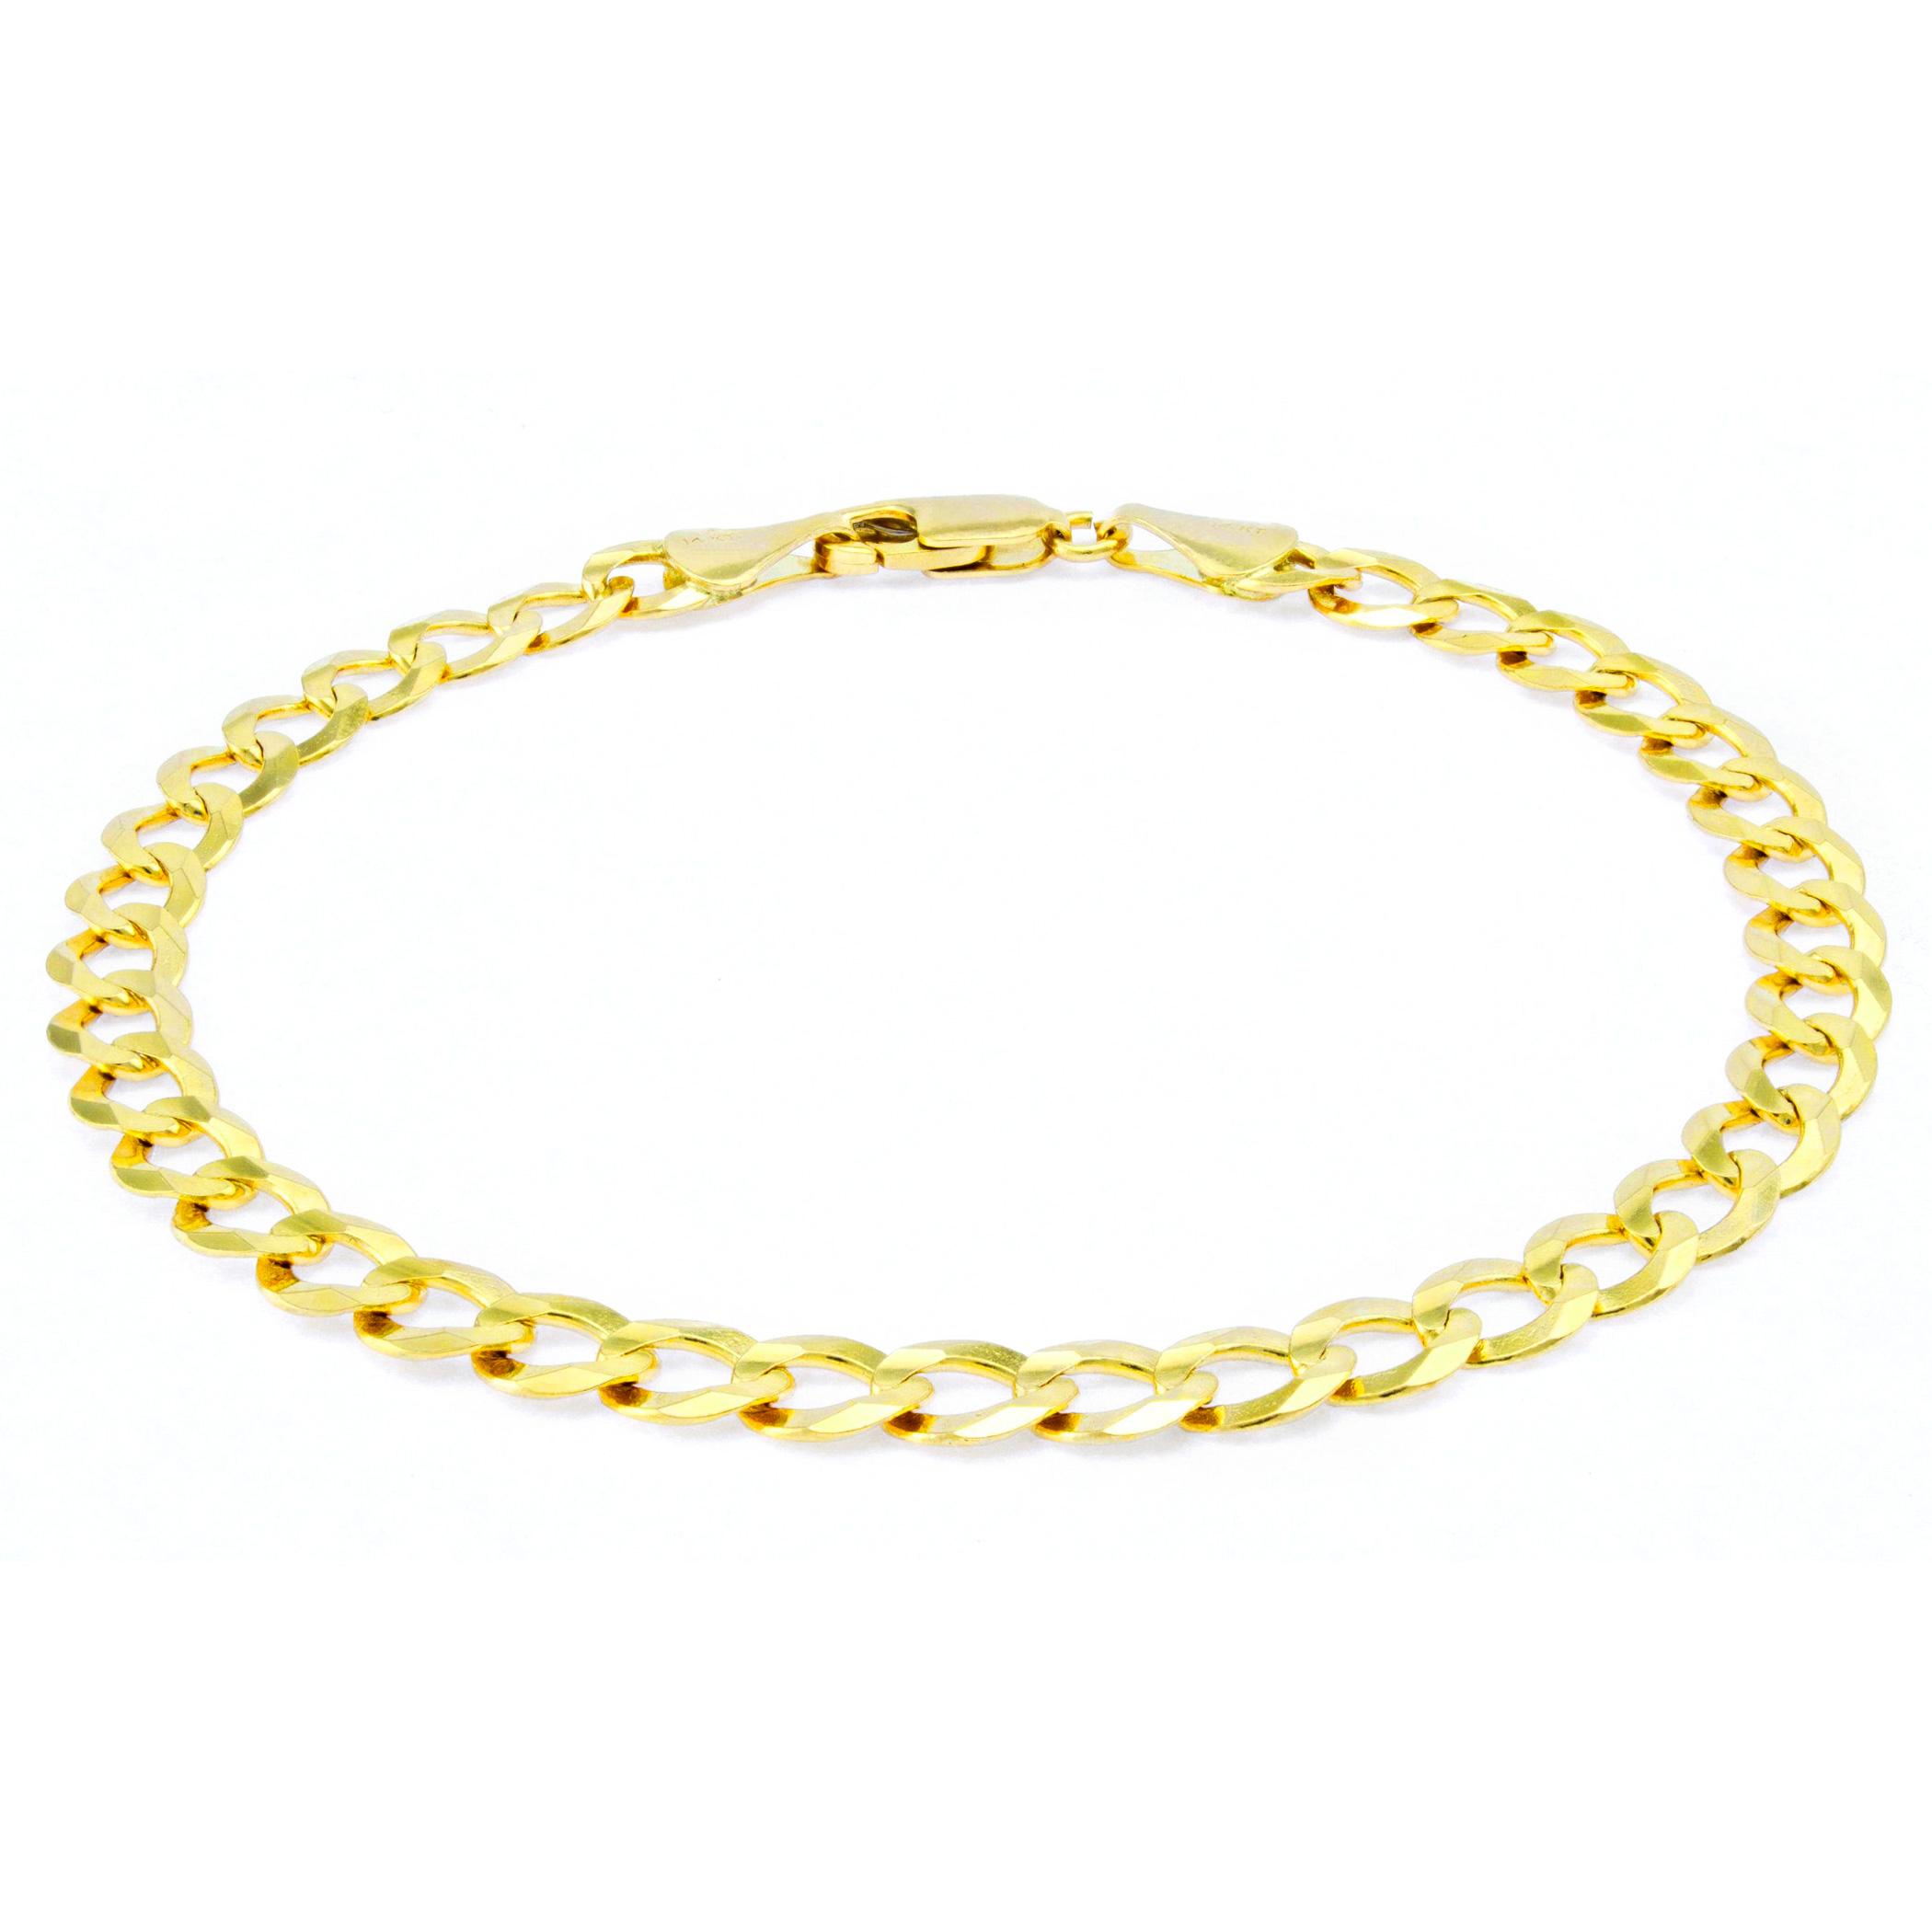 14K-Yellow-Gold-5-5mm-Italian-Curb-Cuban-Link-Chain-Bracelet-Mens-Women-7-034-8-034-9-034 thumbnail 15